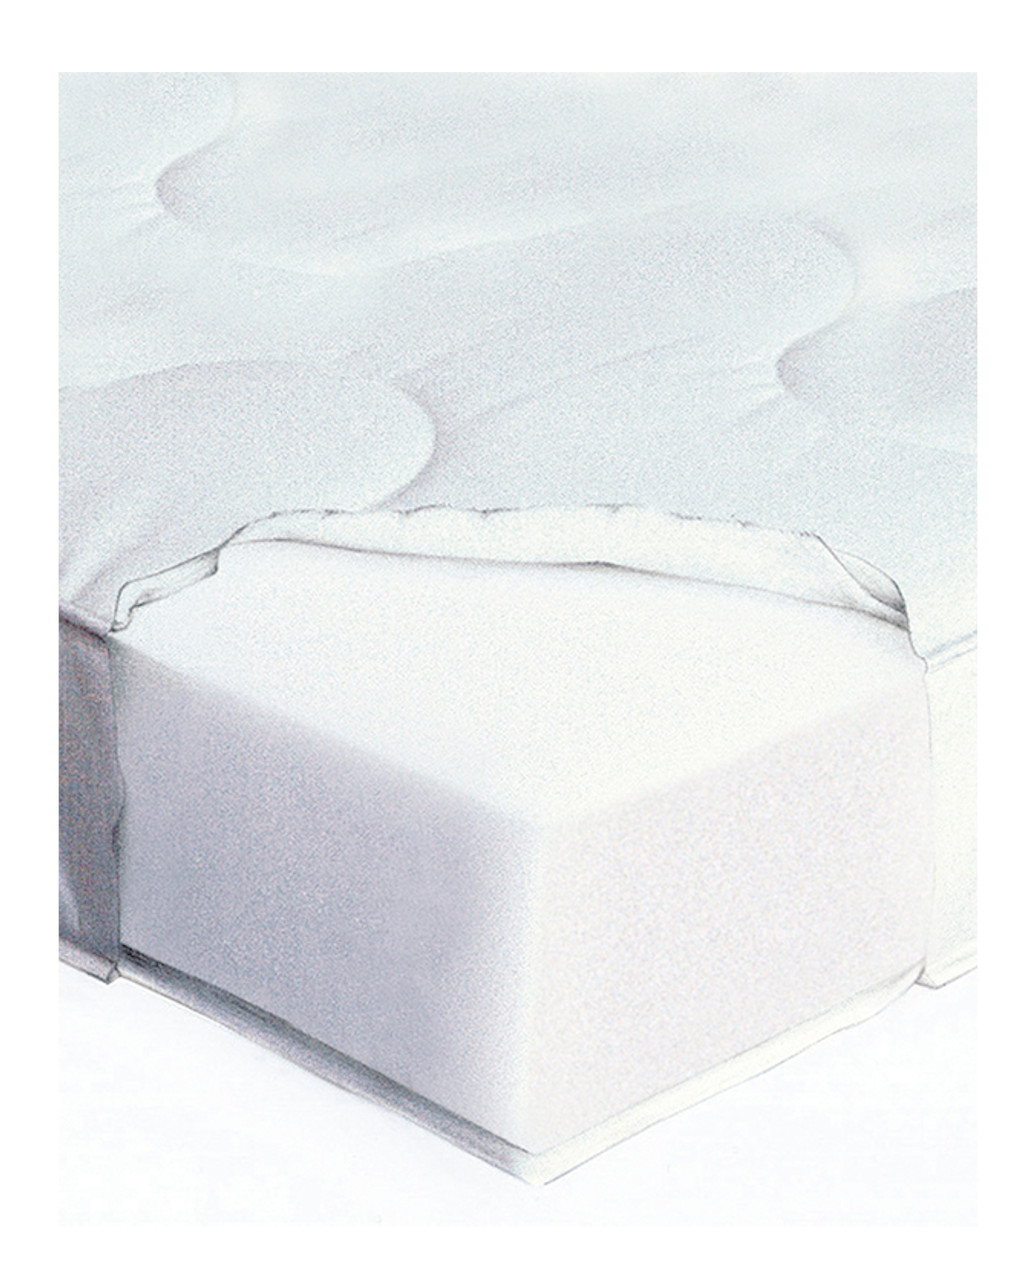 Materasso antiacaro giordani per lettino - Giordani